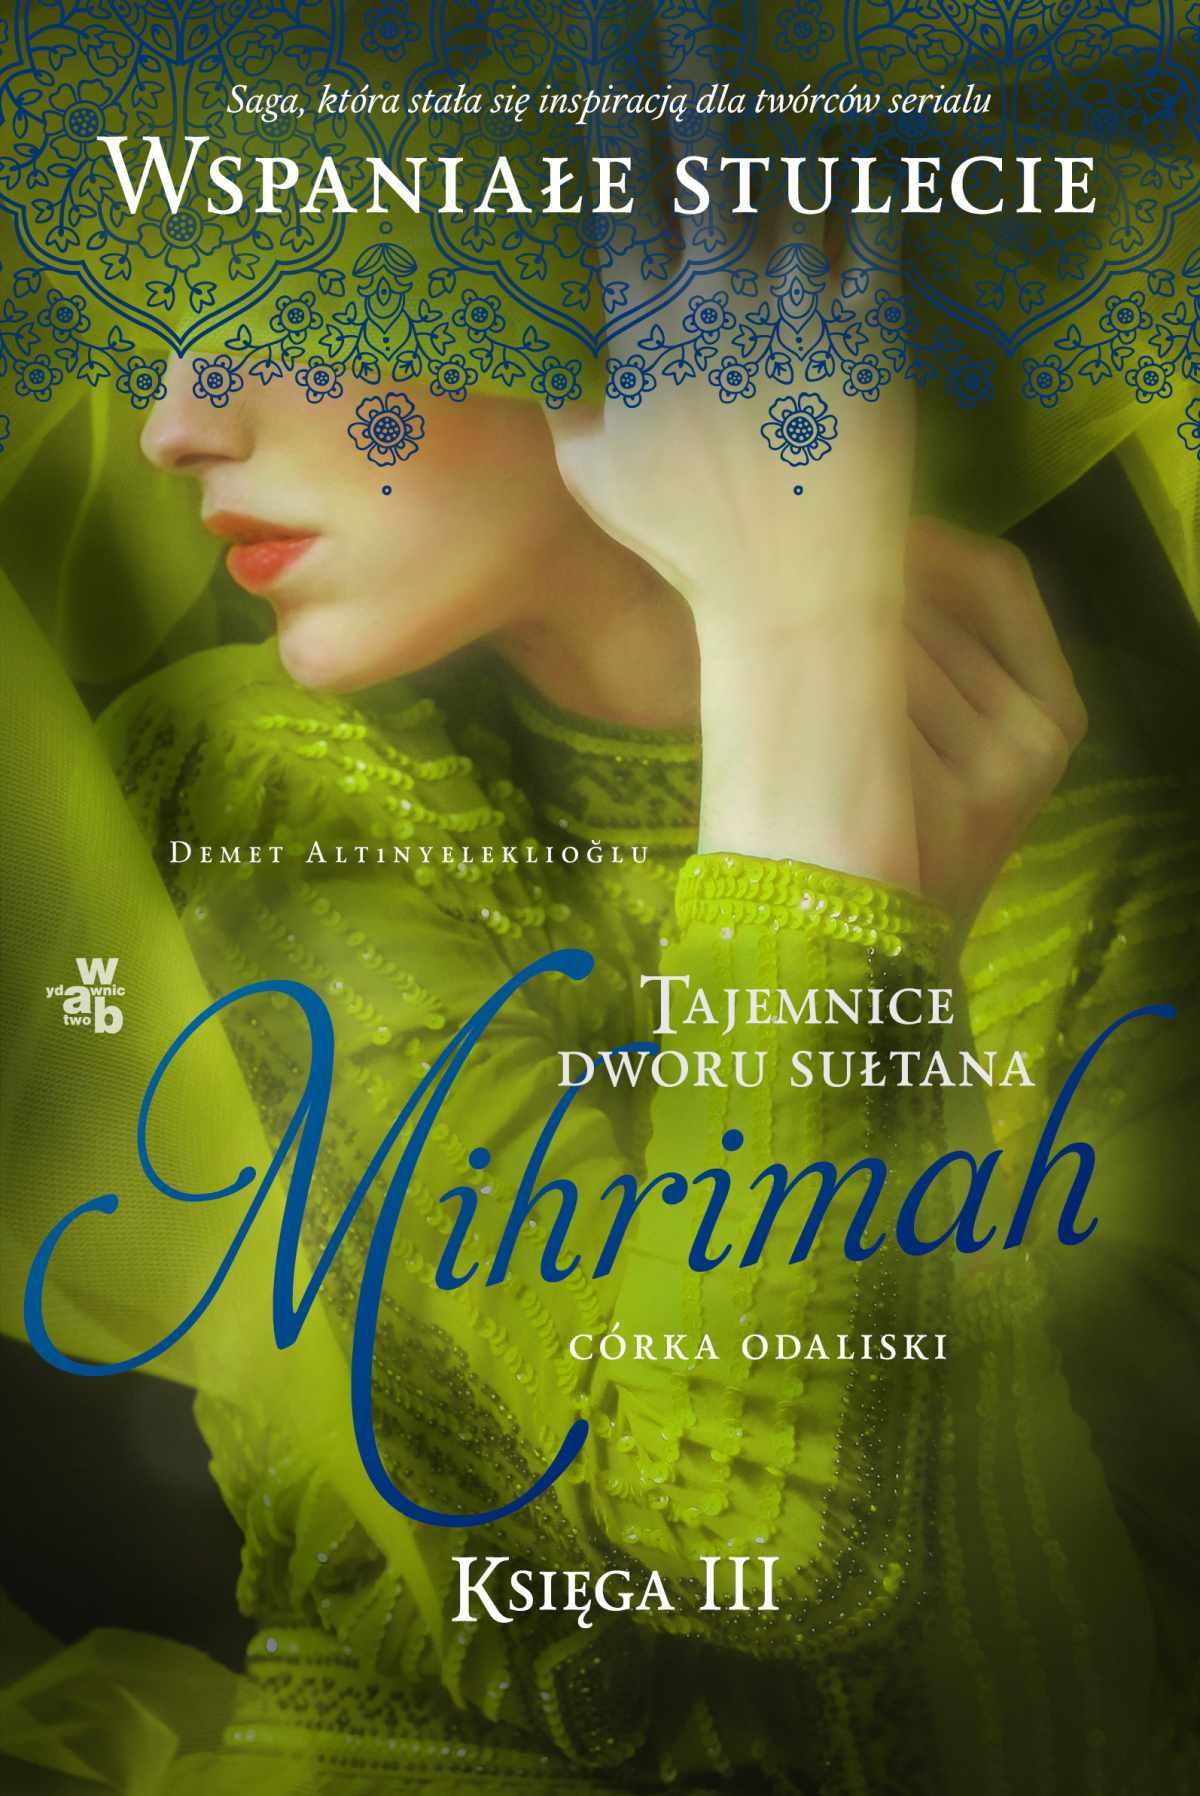 Tajemnice dworu sułtana. Mihrimah. Córka odaliski. Księga 3 - Ebook (Książka na Kindle) do pobrania w formacie MOBI